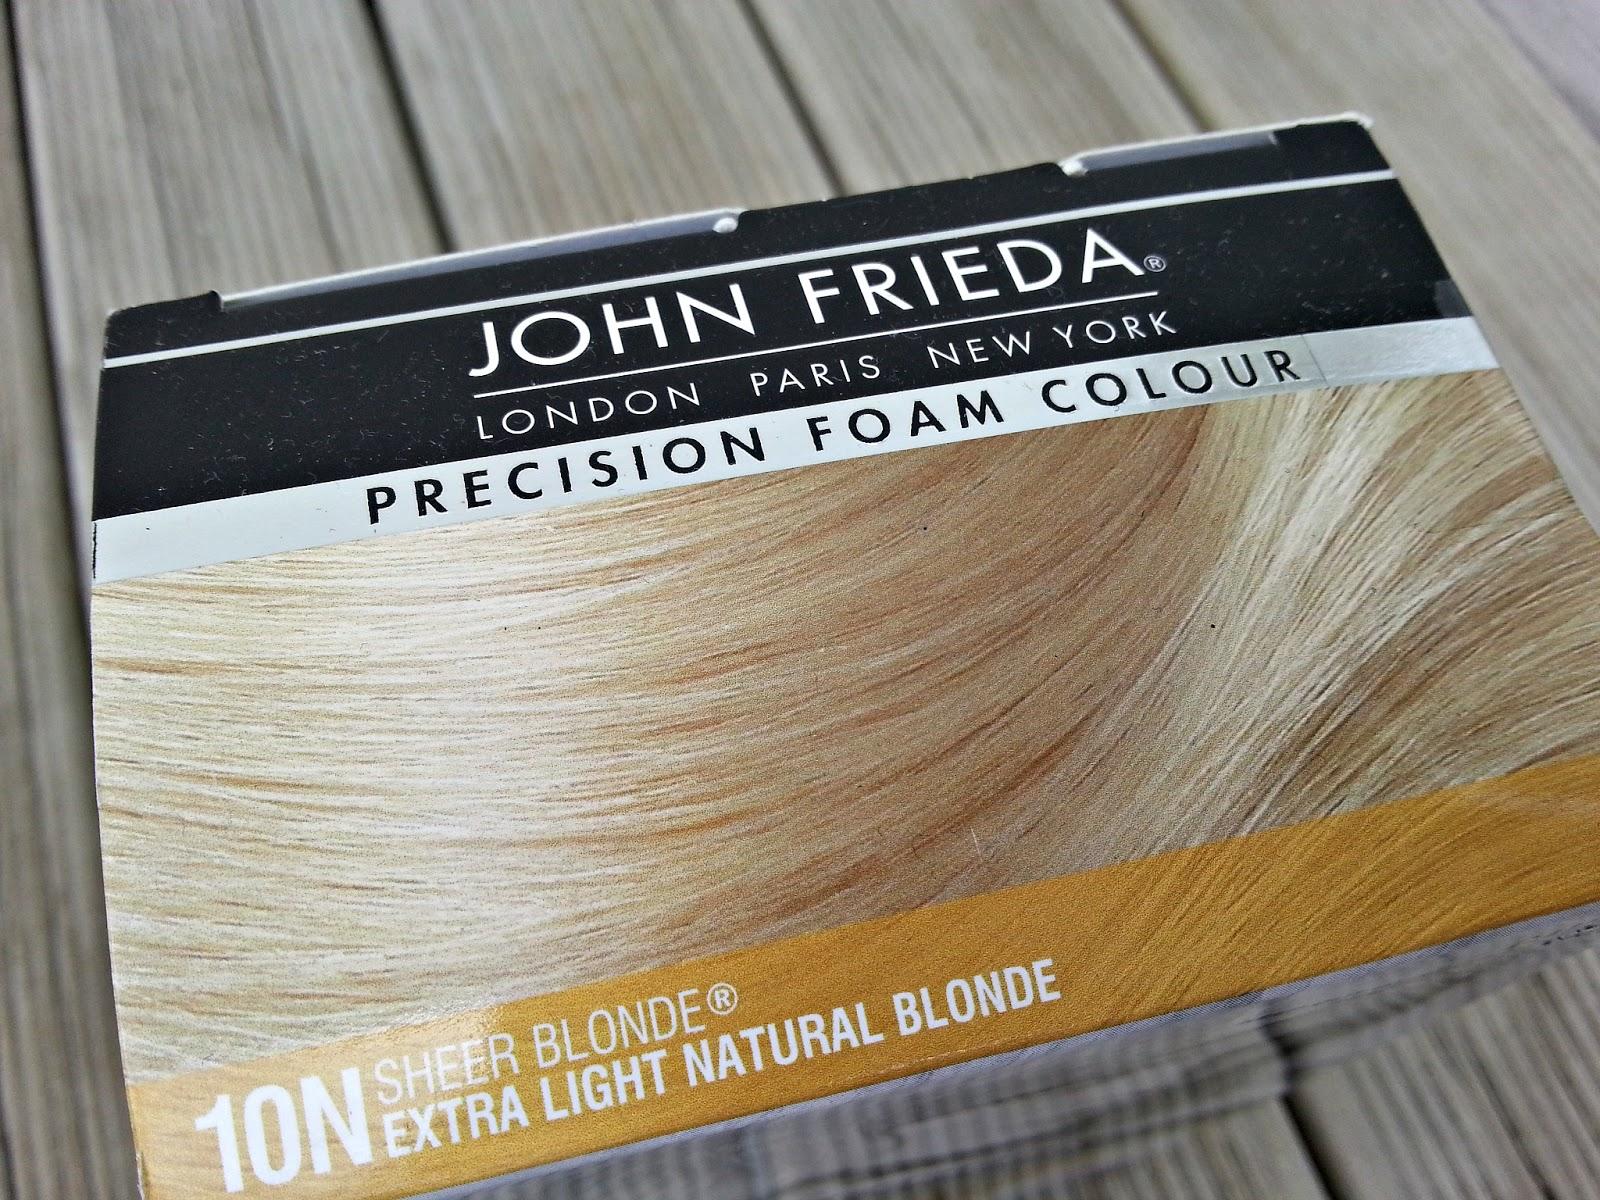 Review John Frieda Foam Extra Light Natural Blonde Confessions